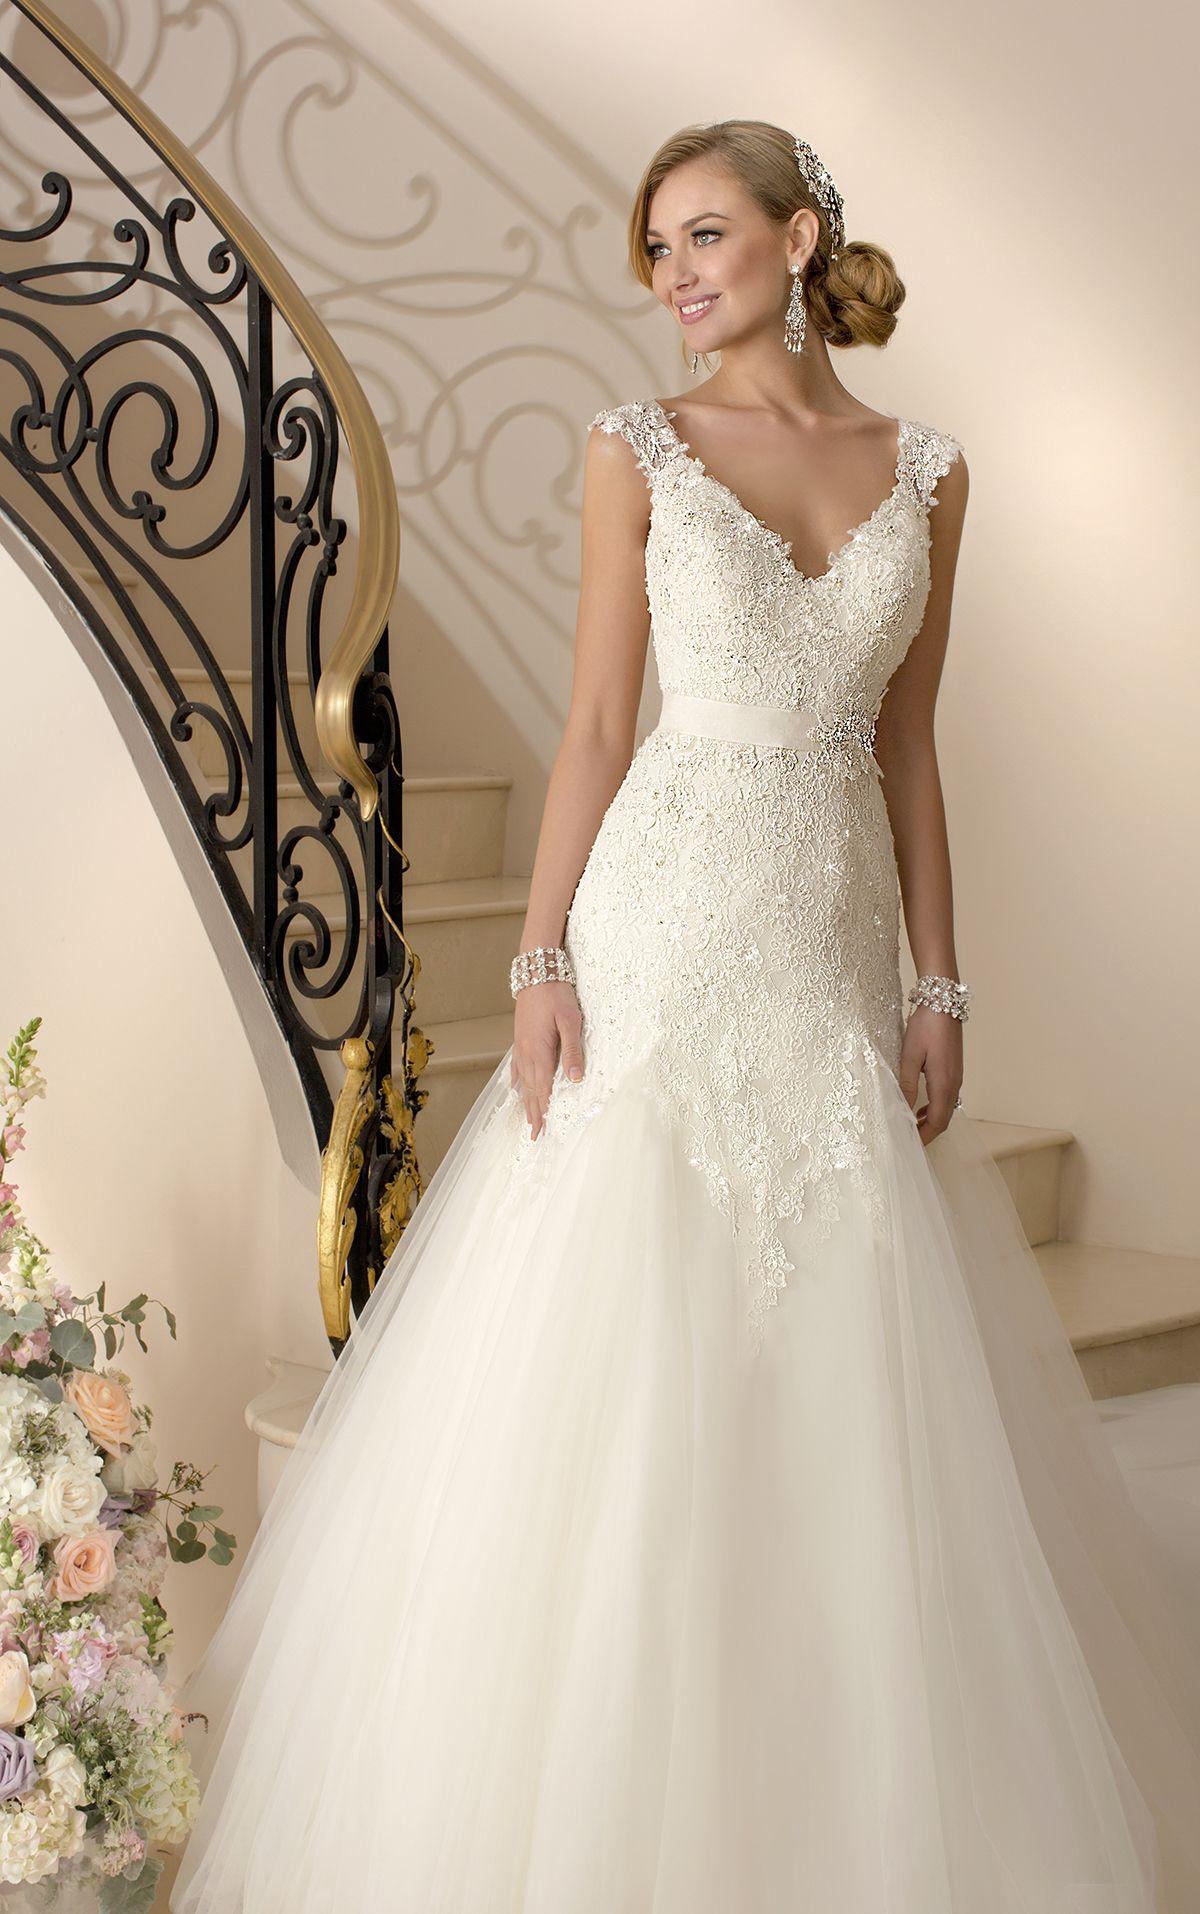 Lace Cap Sleeve Wedding Dress By Stella York Style 5949 Dream